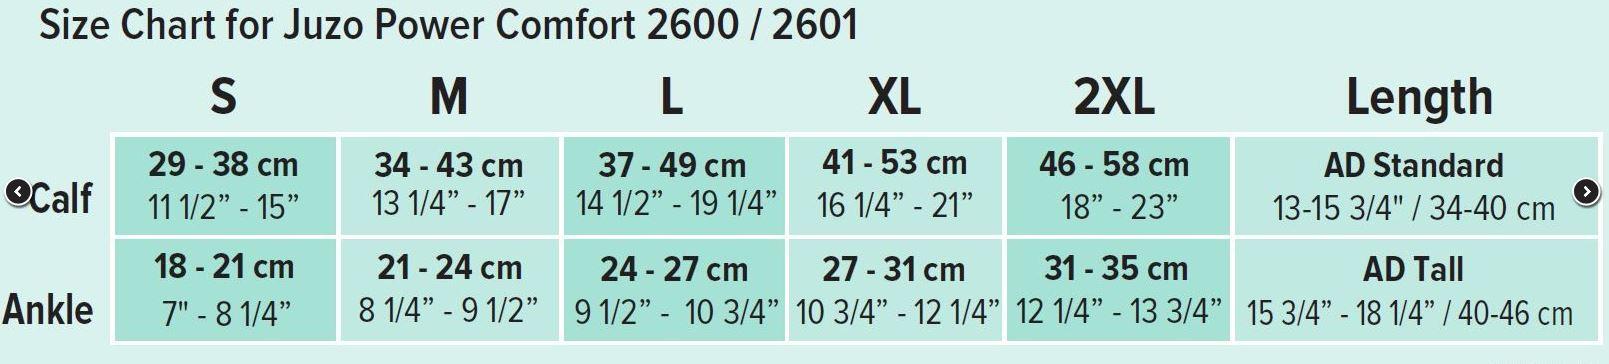 juzo2600-2601-size-chart.jpg